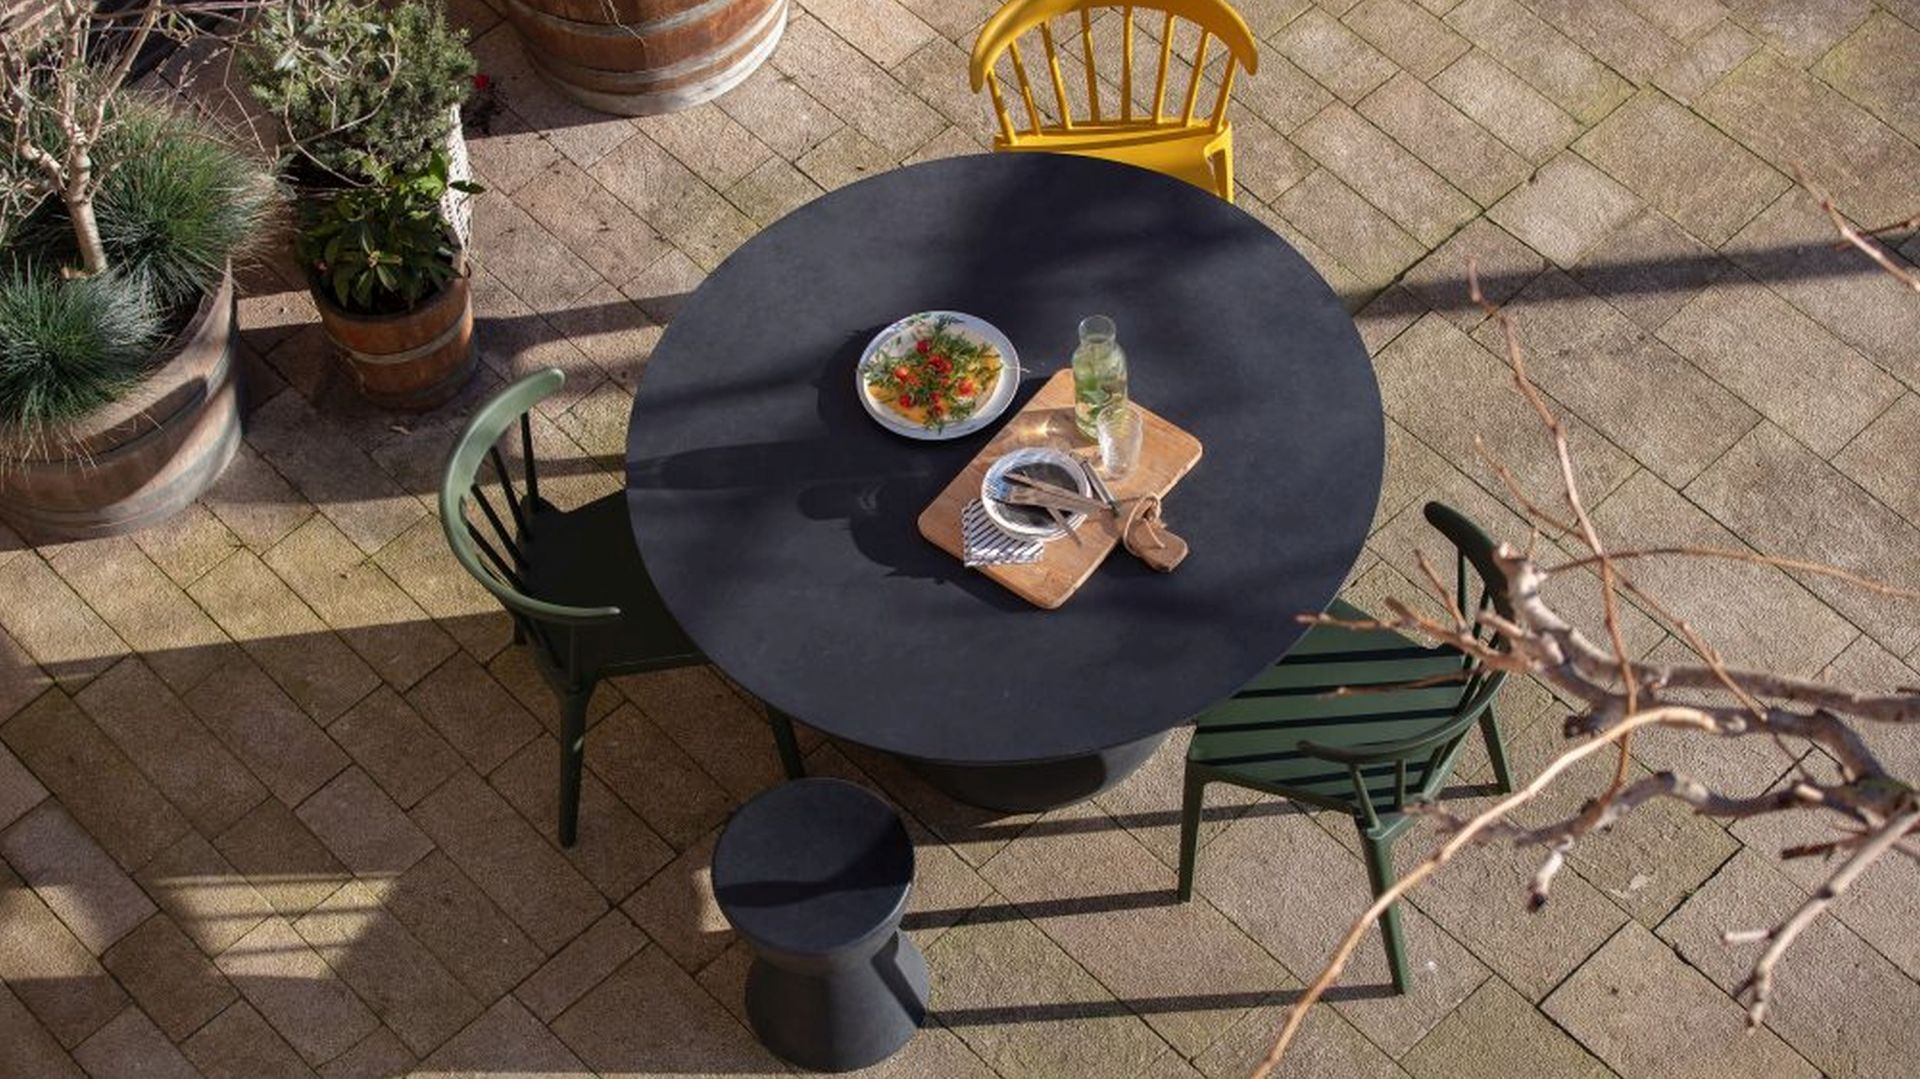 Poczuj wiosnę wokół domu! Pomysły na ogród, taras, balkon. Fot. Woood Bliss